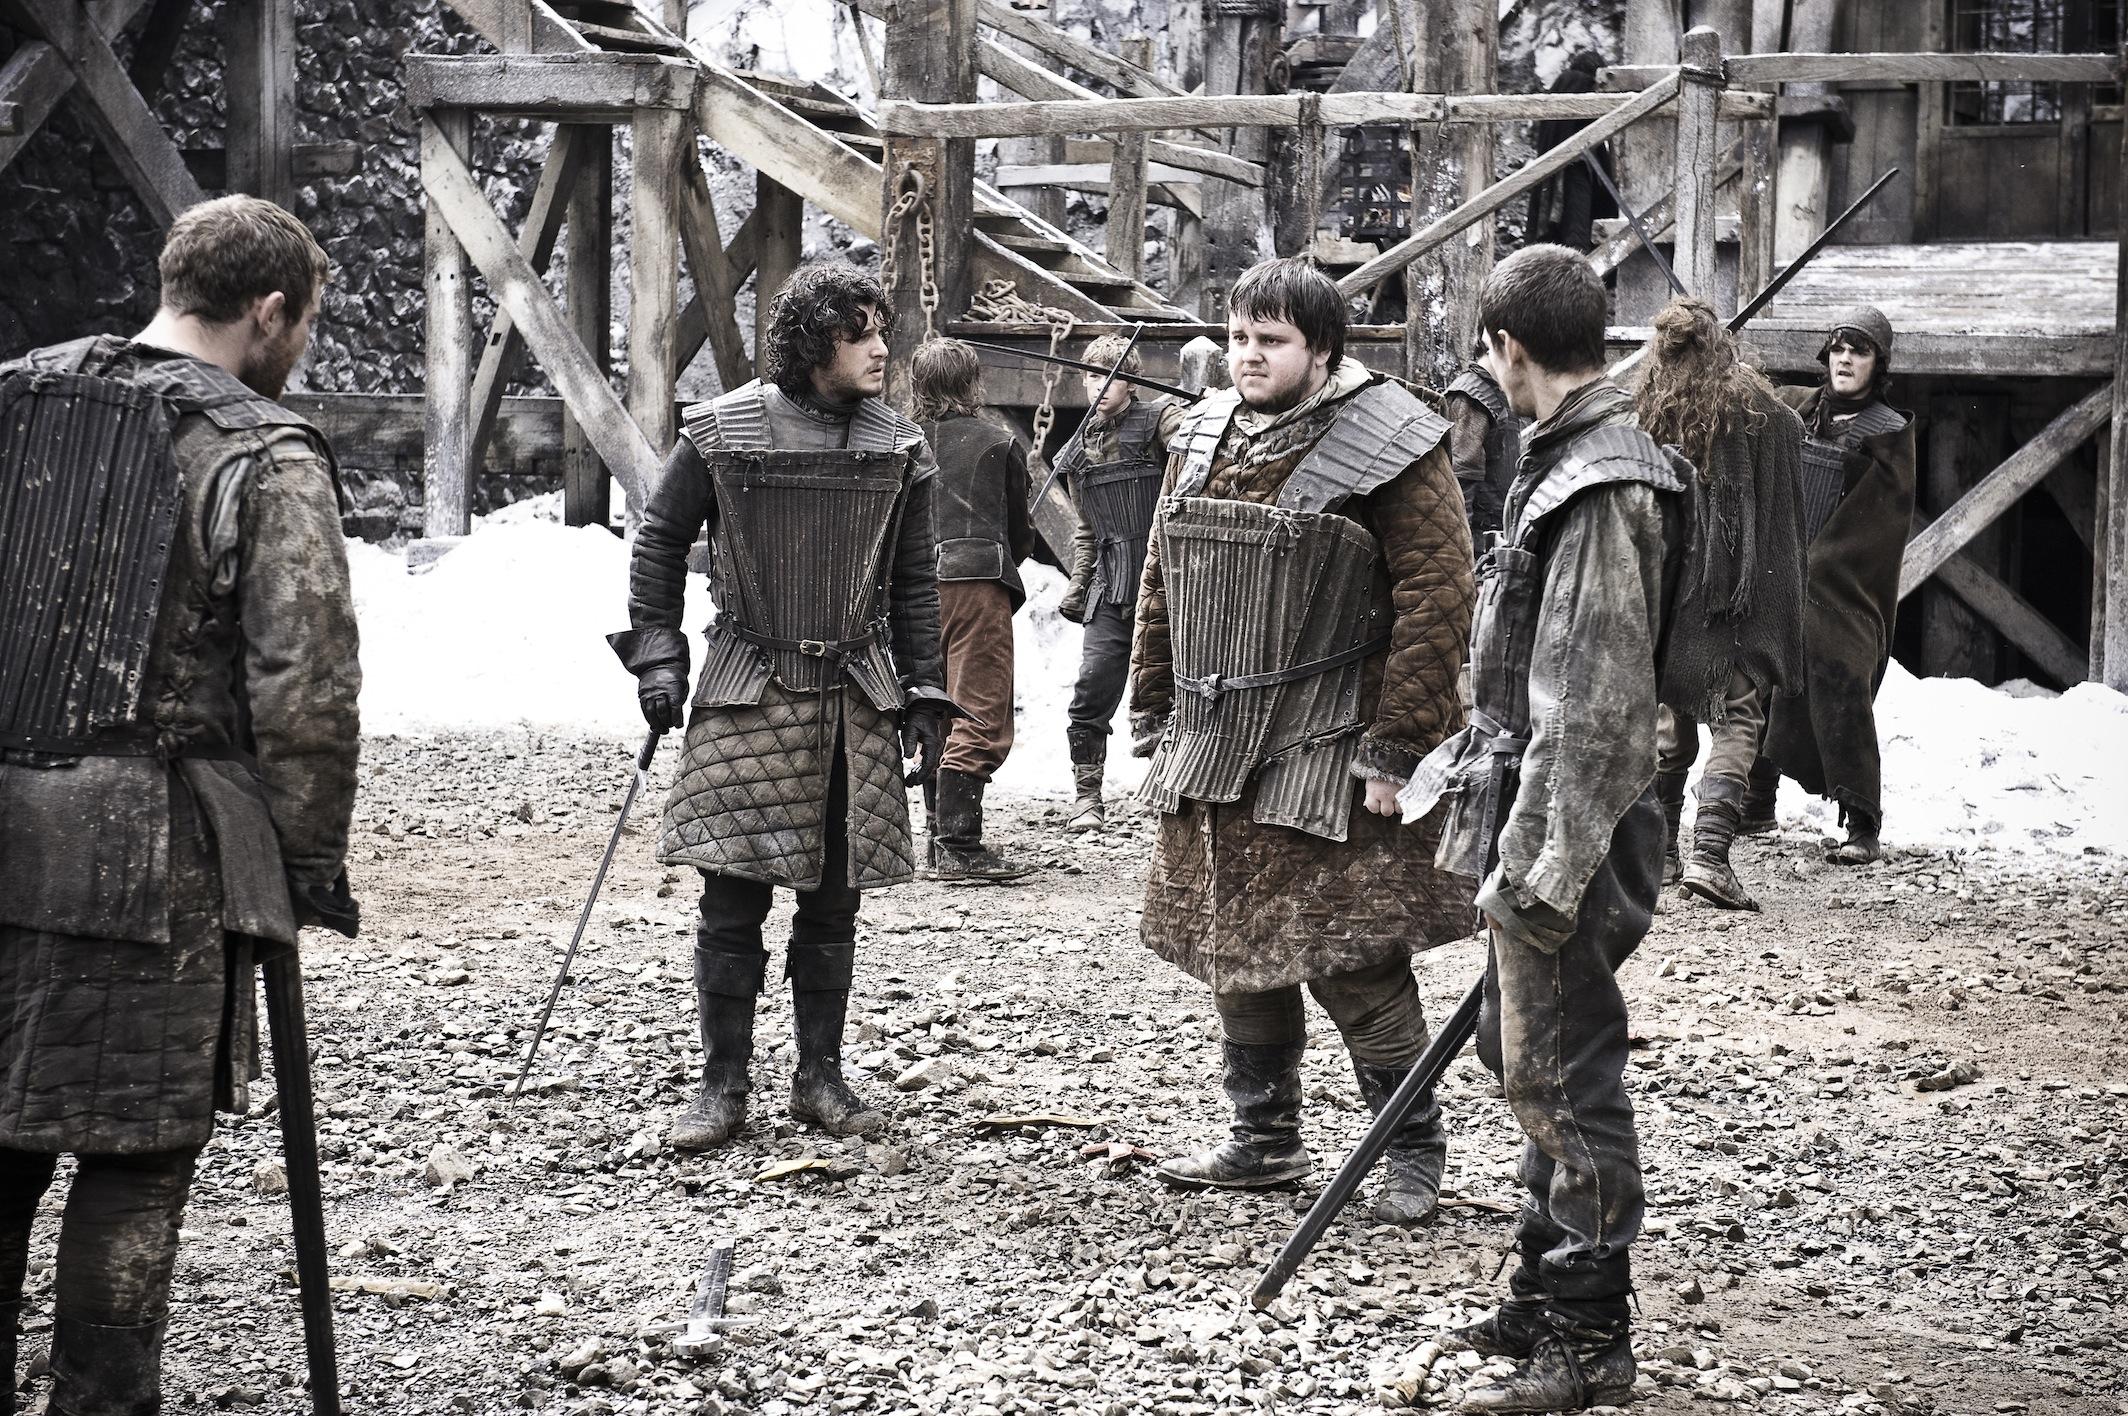 Jon Snow with Samwell, Pypar and Grenn